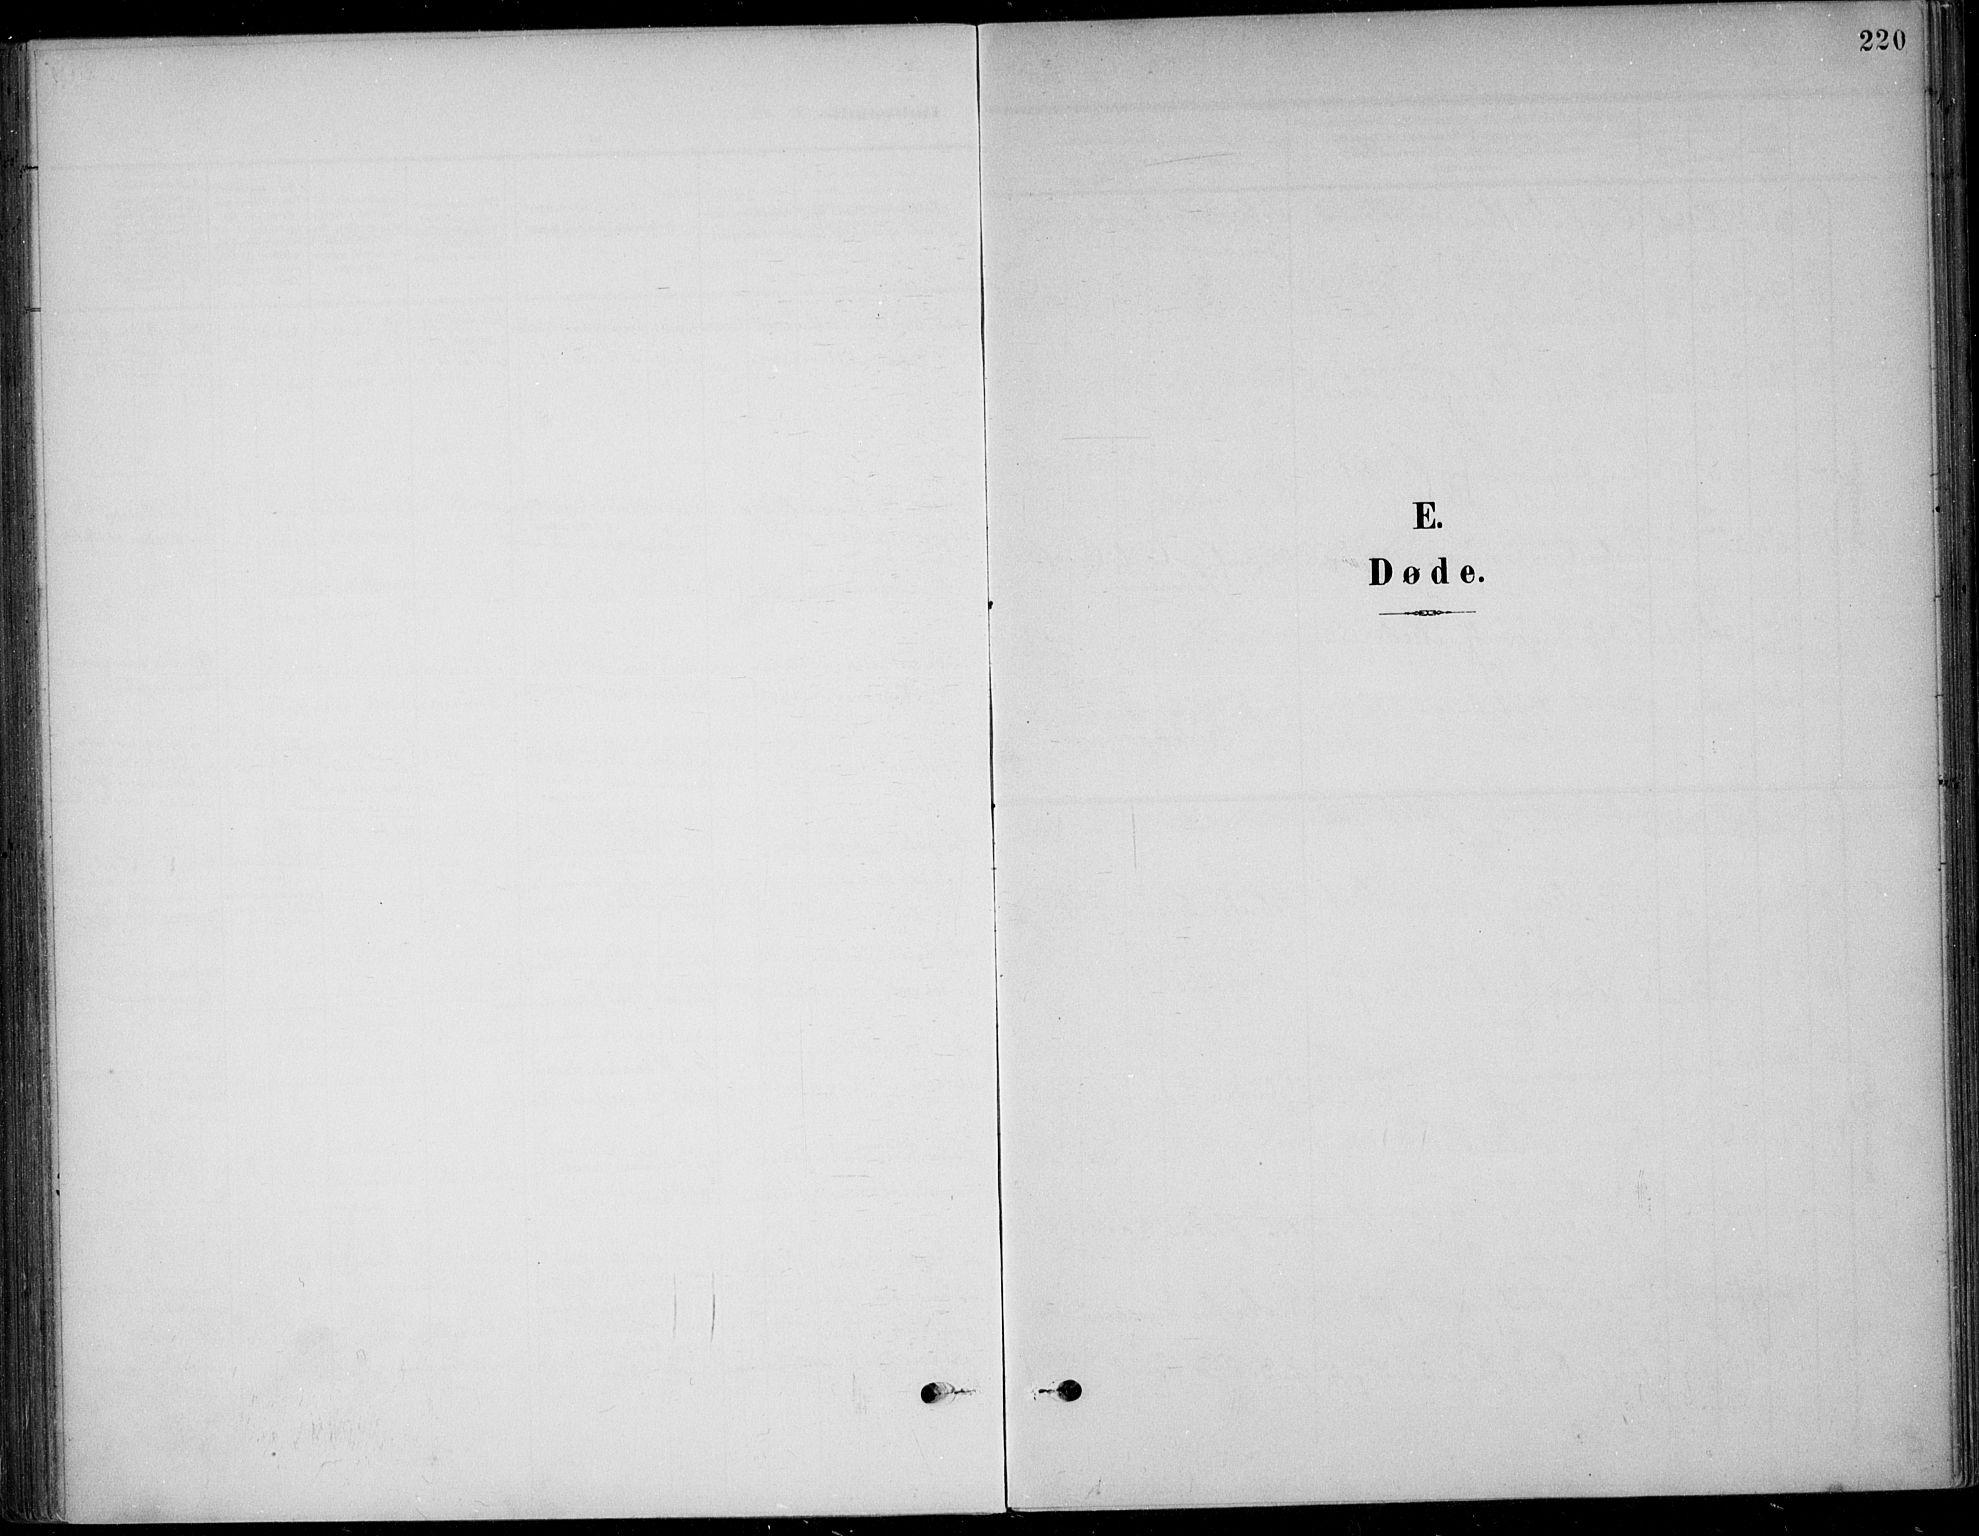 SAKO, Solum kirkebøker, F/Fb/L0003: Ministerialbok nr. II 3, 1901-1912, s. 220